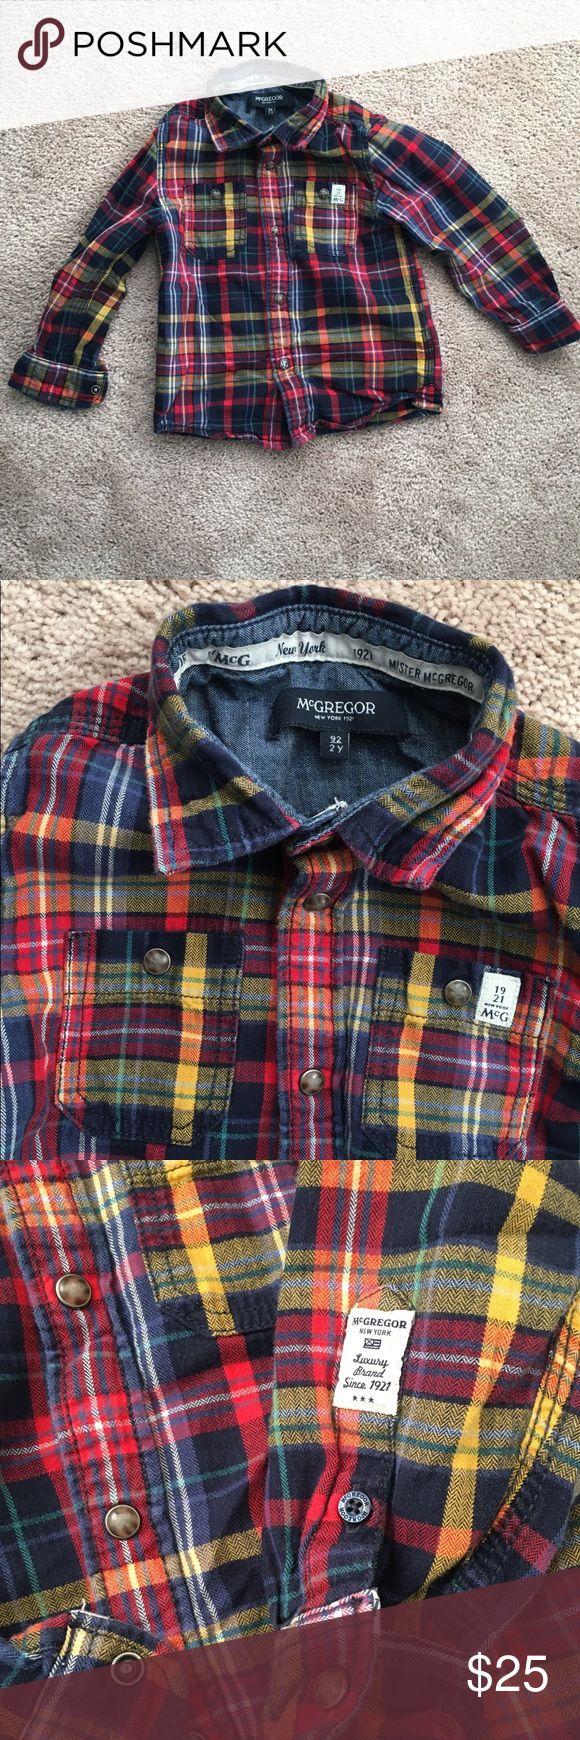 Mcgregor New York 1921 Toddler Button Up Mcgregor New York 1921 toddler Button up plaid Size 2Y In excellent condition! McGregor Shirts & Tops Button Down Shirts